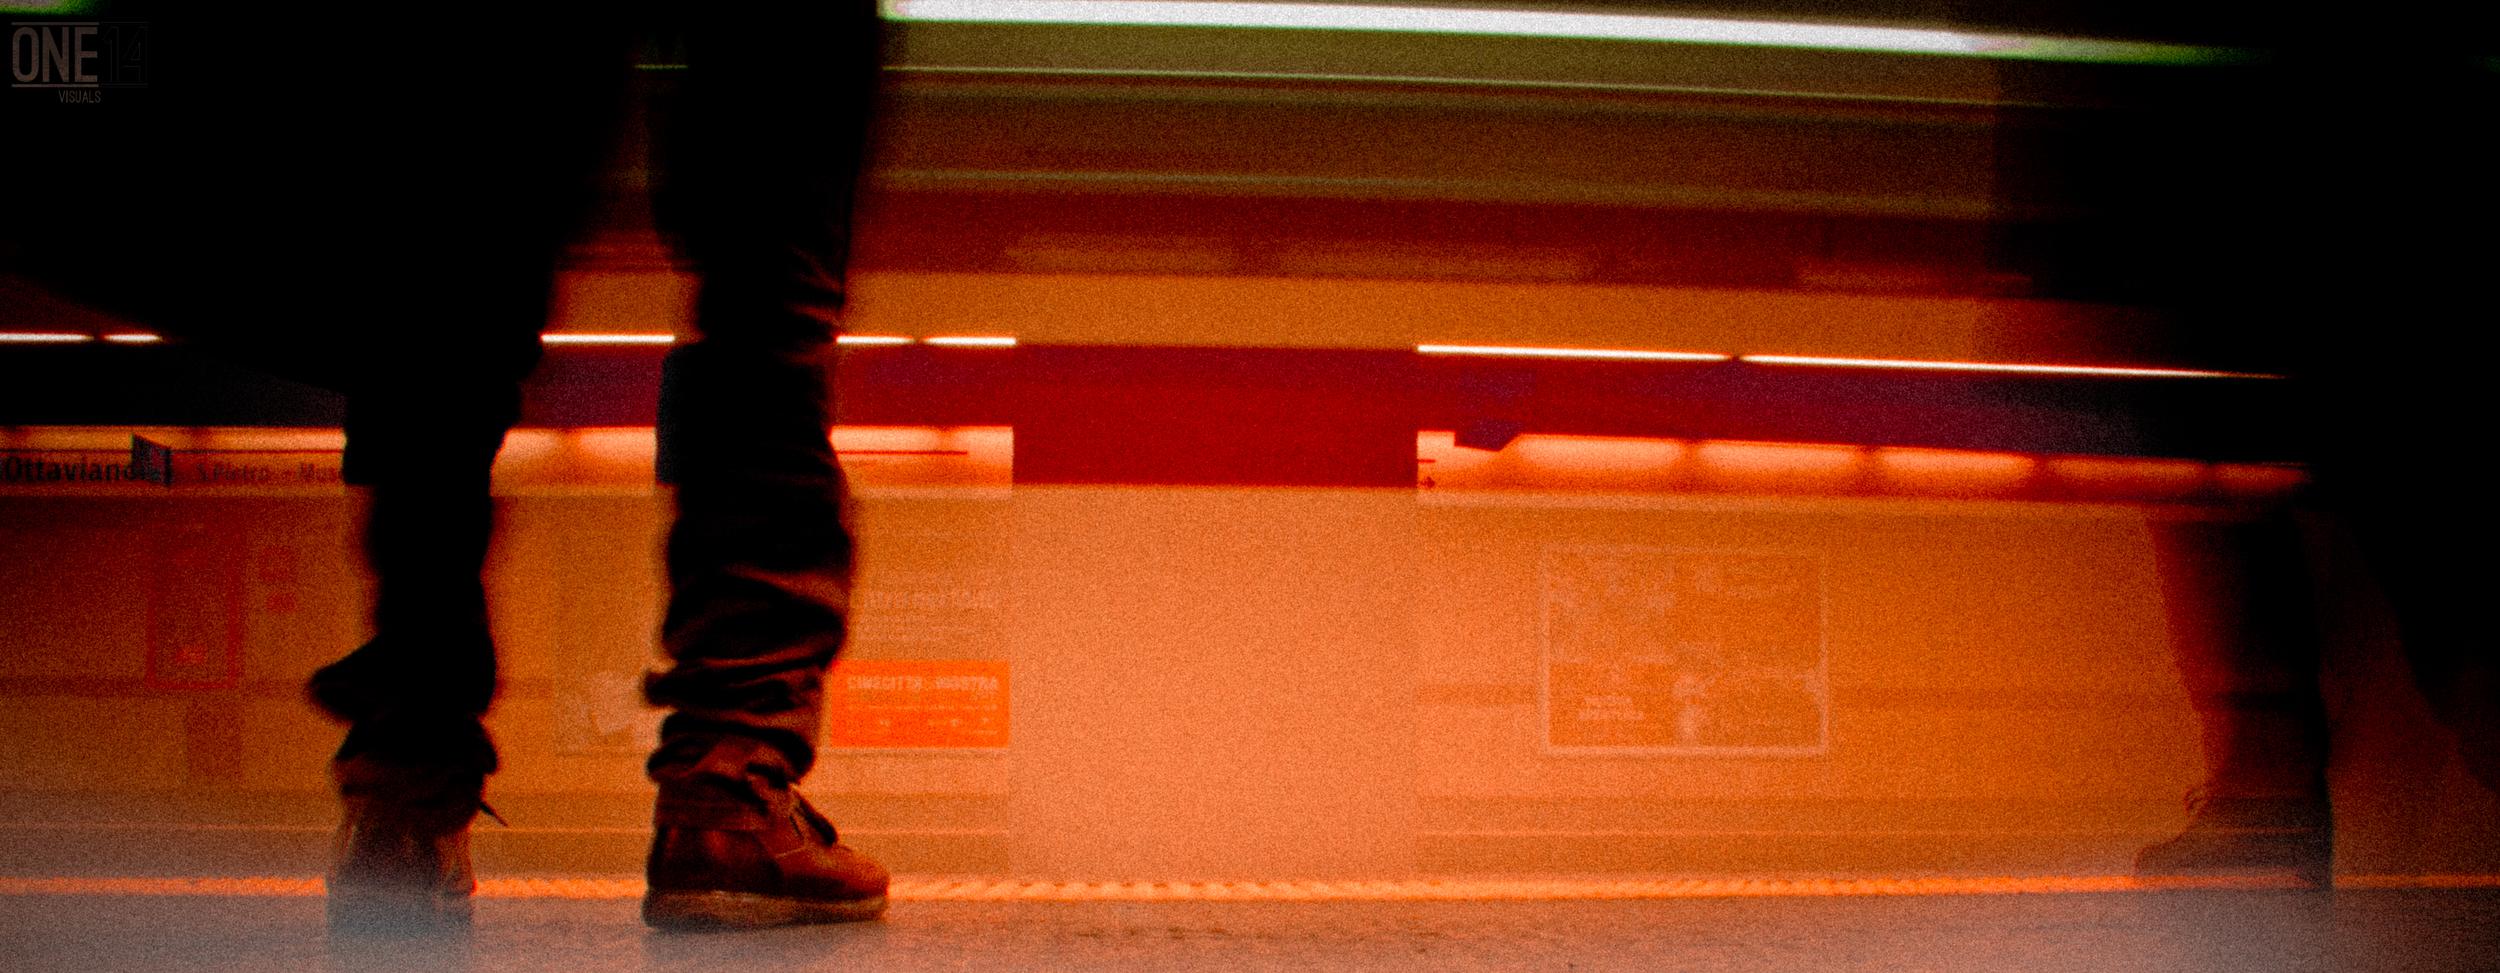 waiting platform.jpg